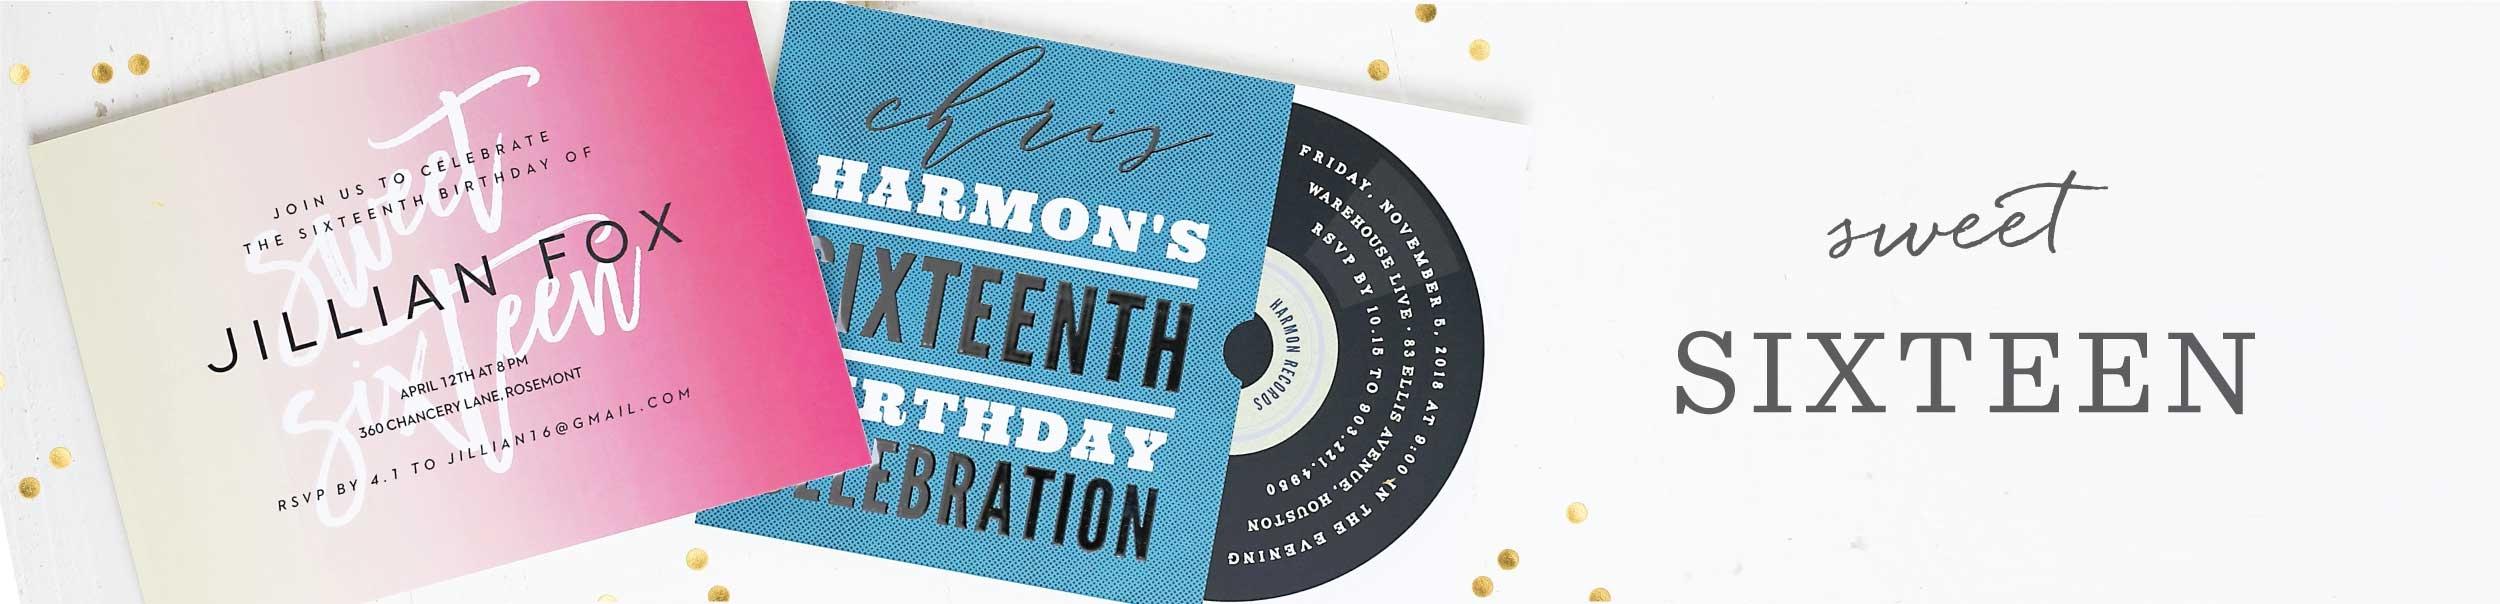 VIP Pass Sweet Sixteen Party Invitations